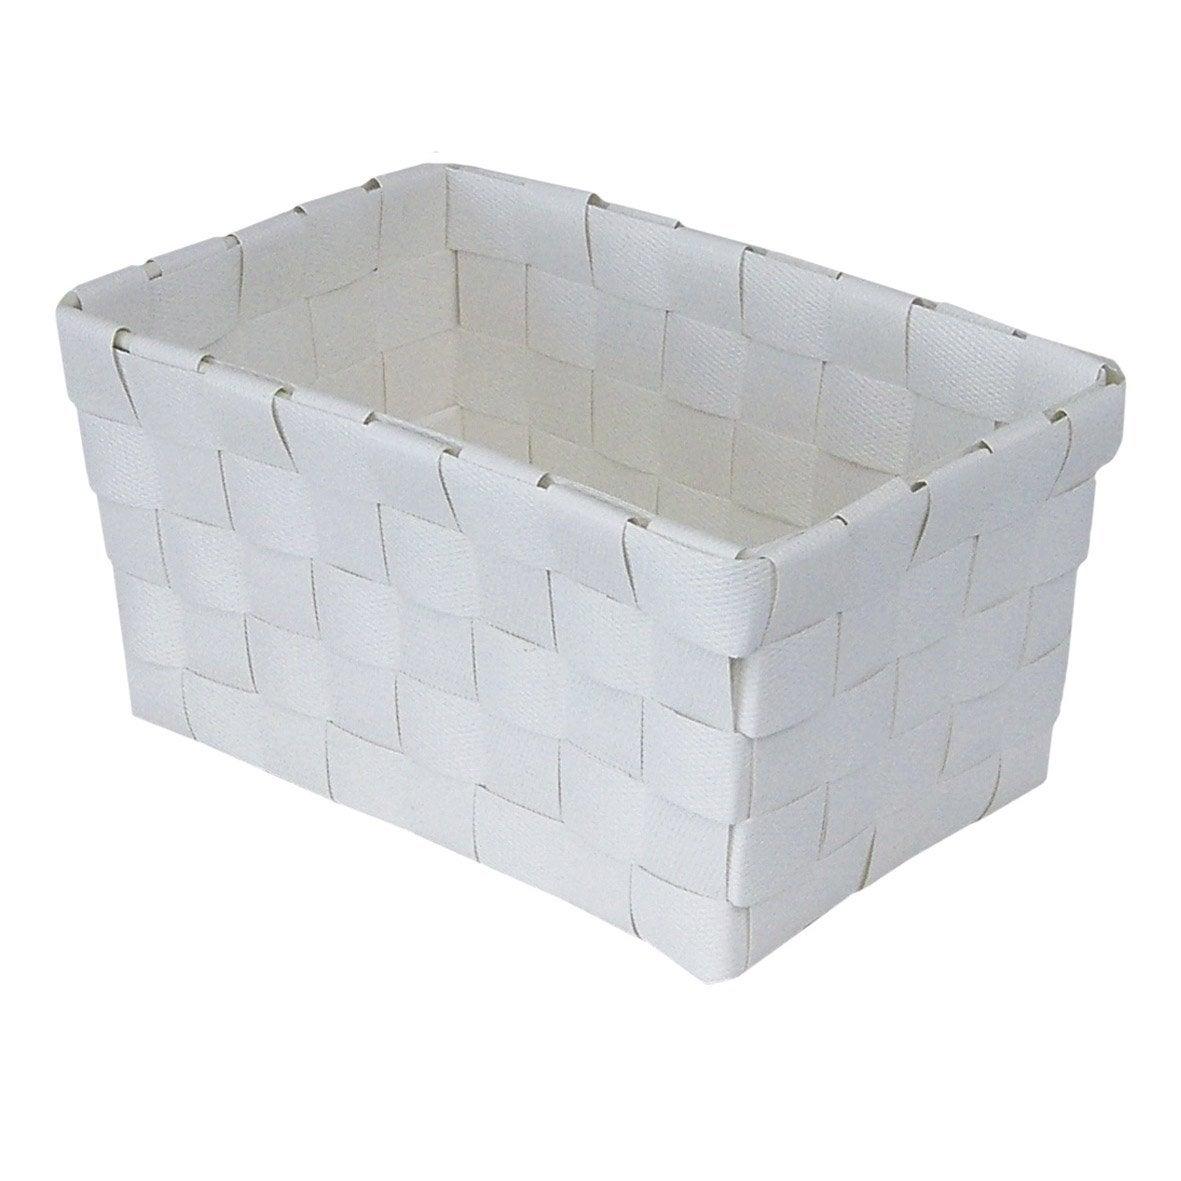 Panier en plastique blanc blanc 0 happy leroy merlin for Rangement salle de bain plastique